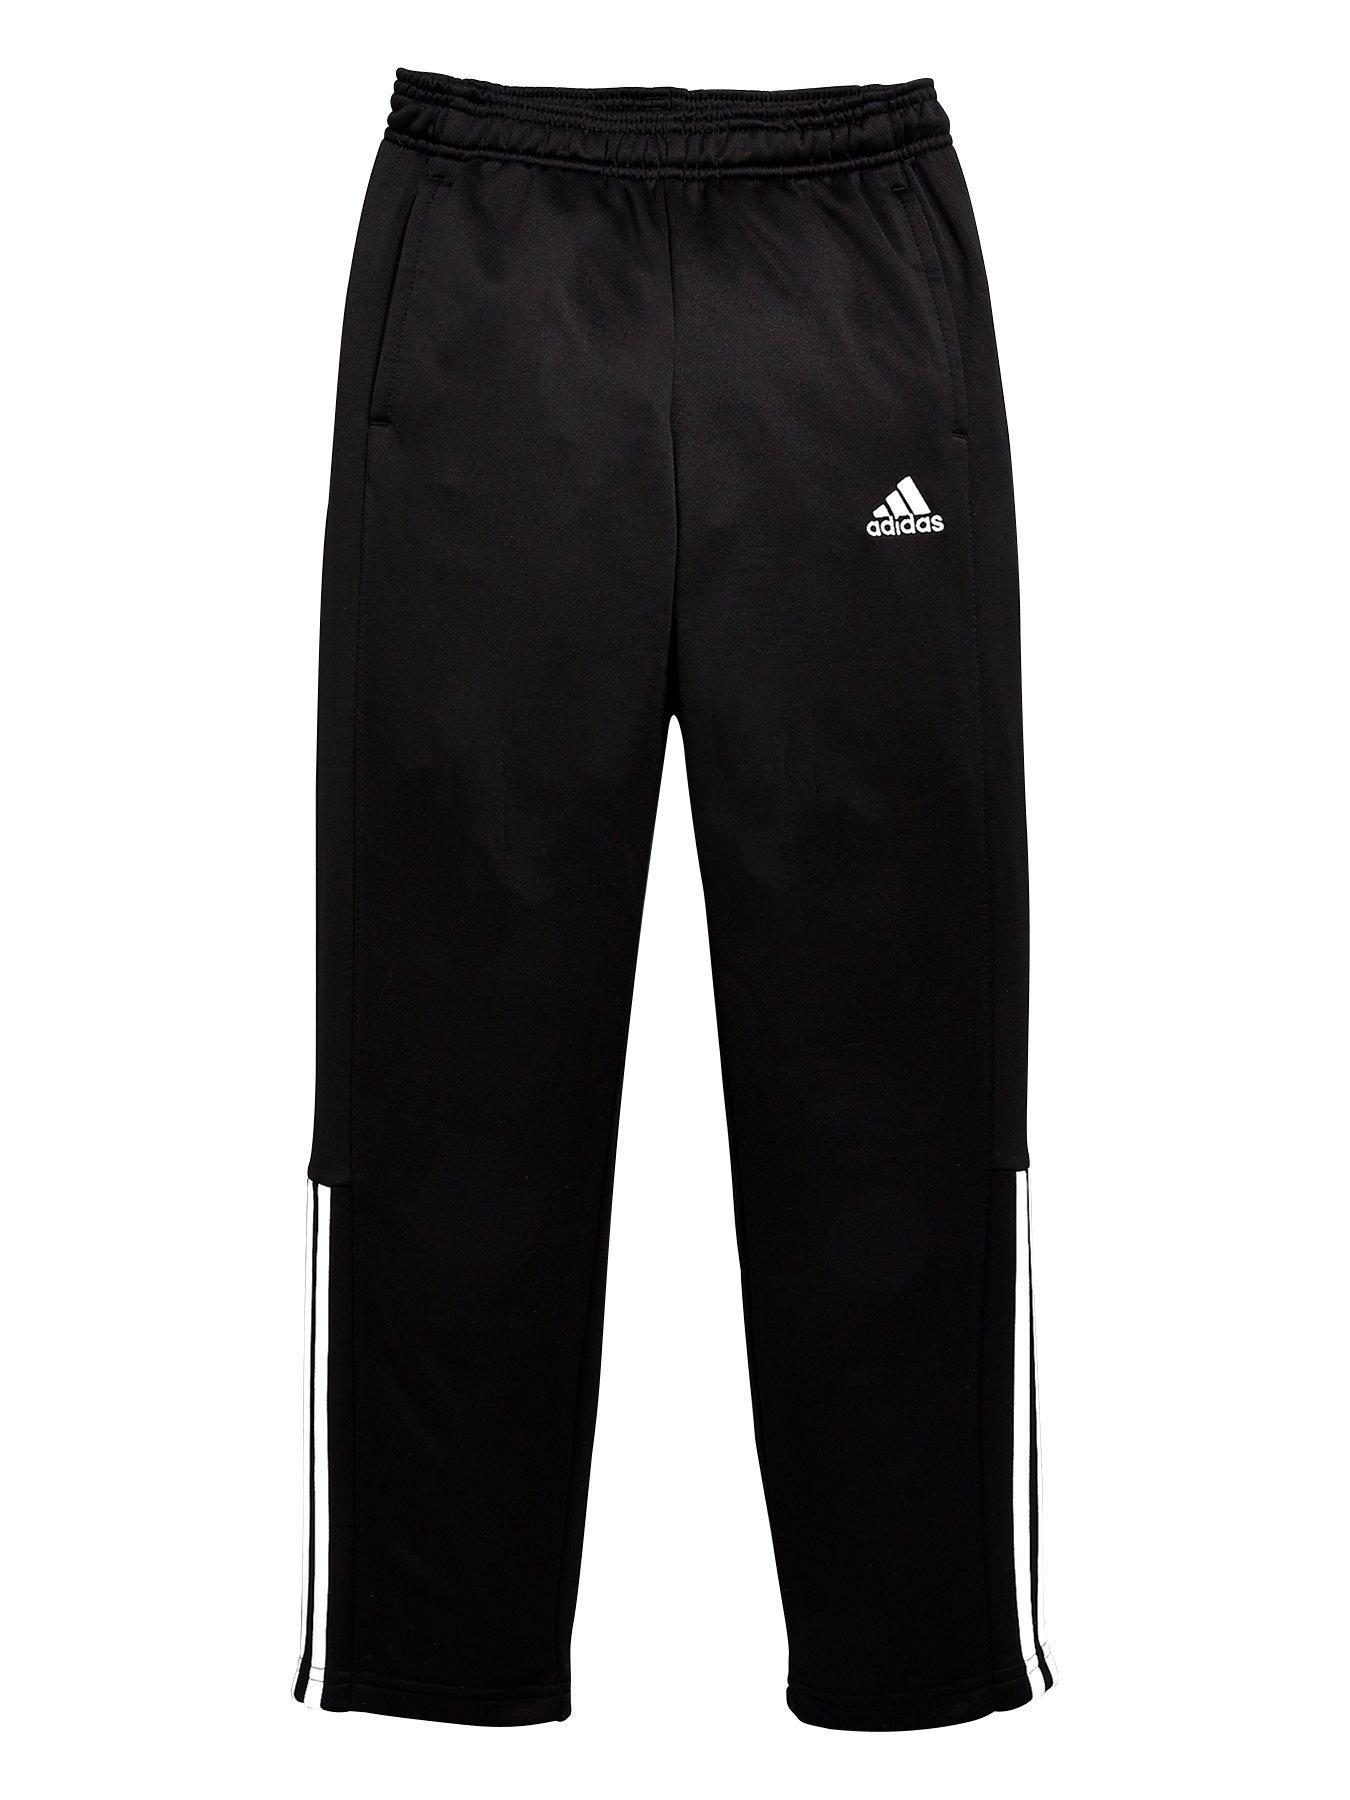 New Kids Boys Stripe School Sport Navy Black Pants Tracksuit Bottoms 2-3 Years